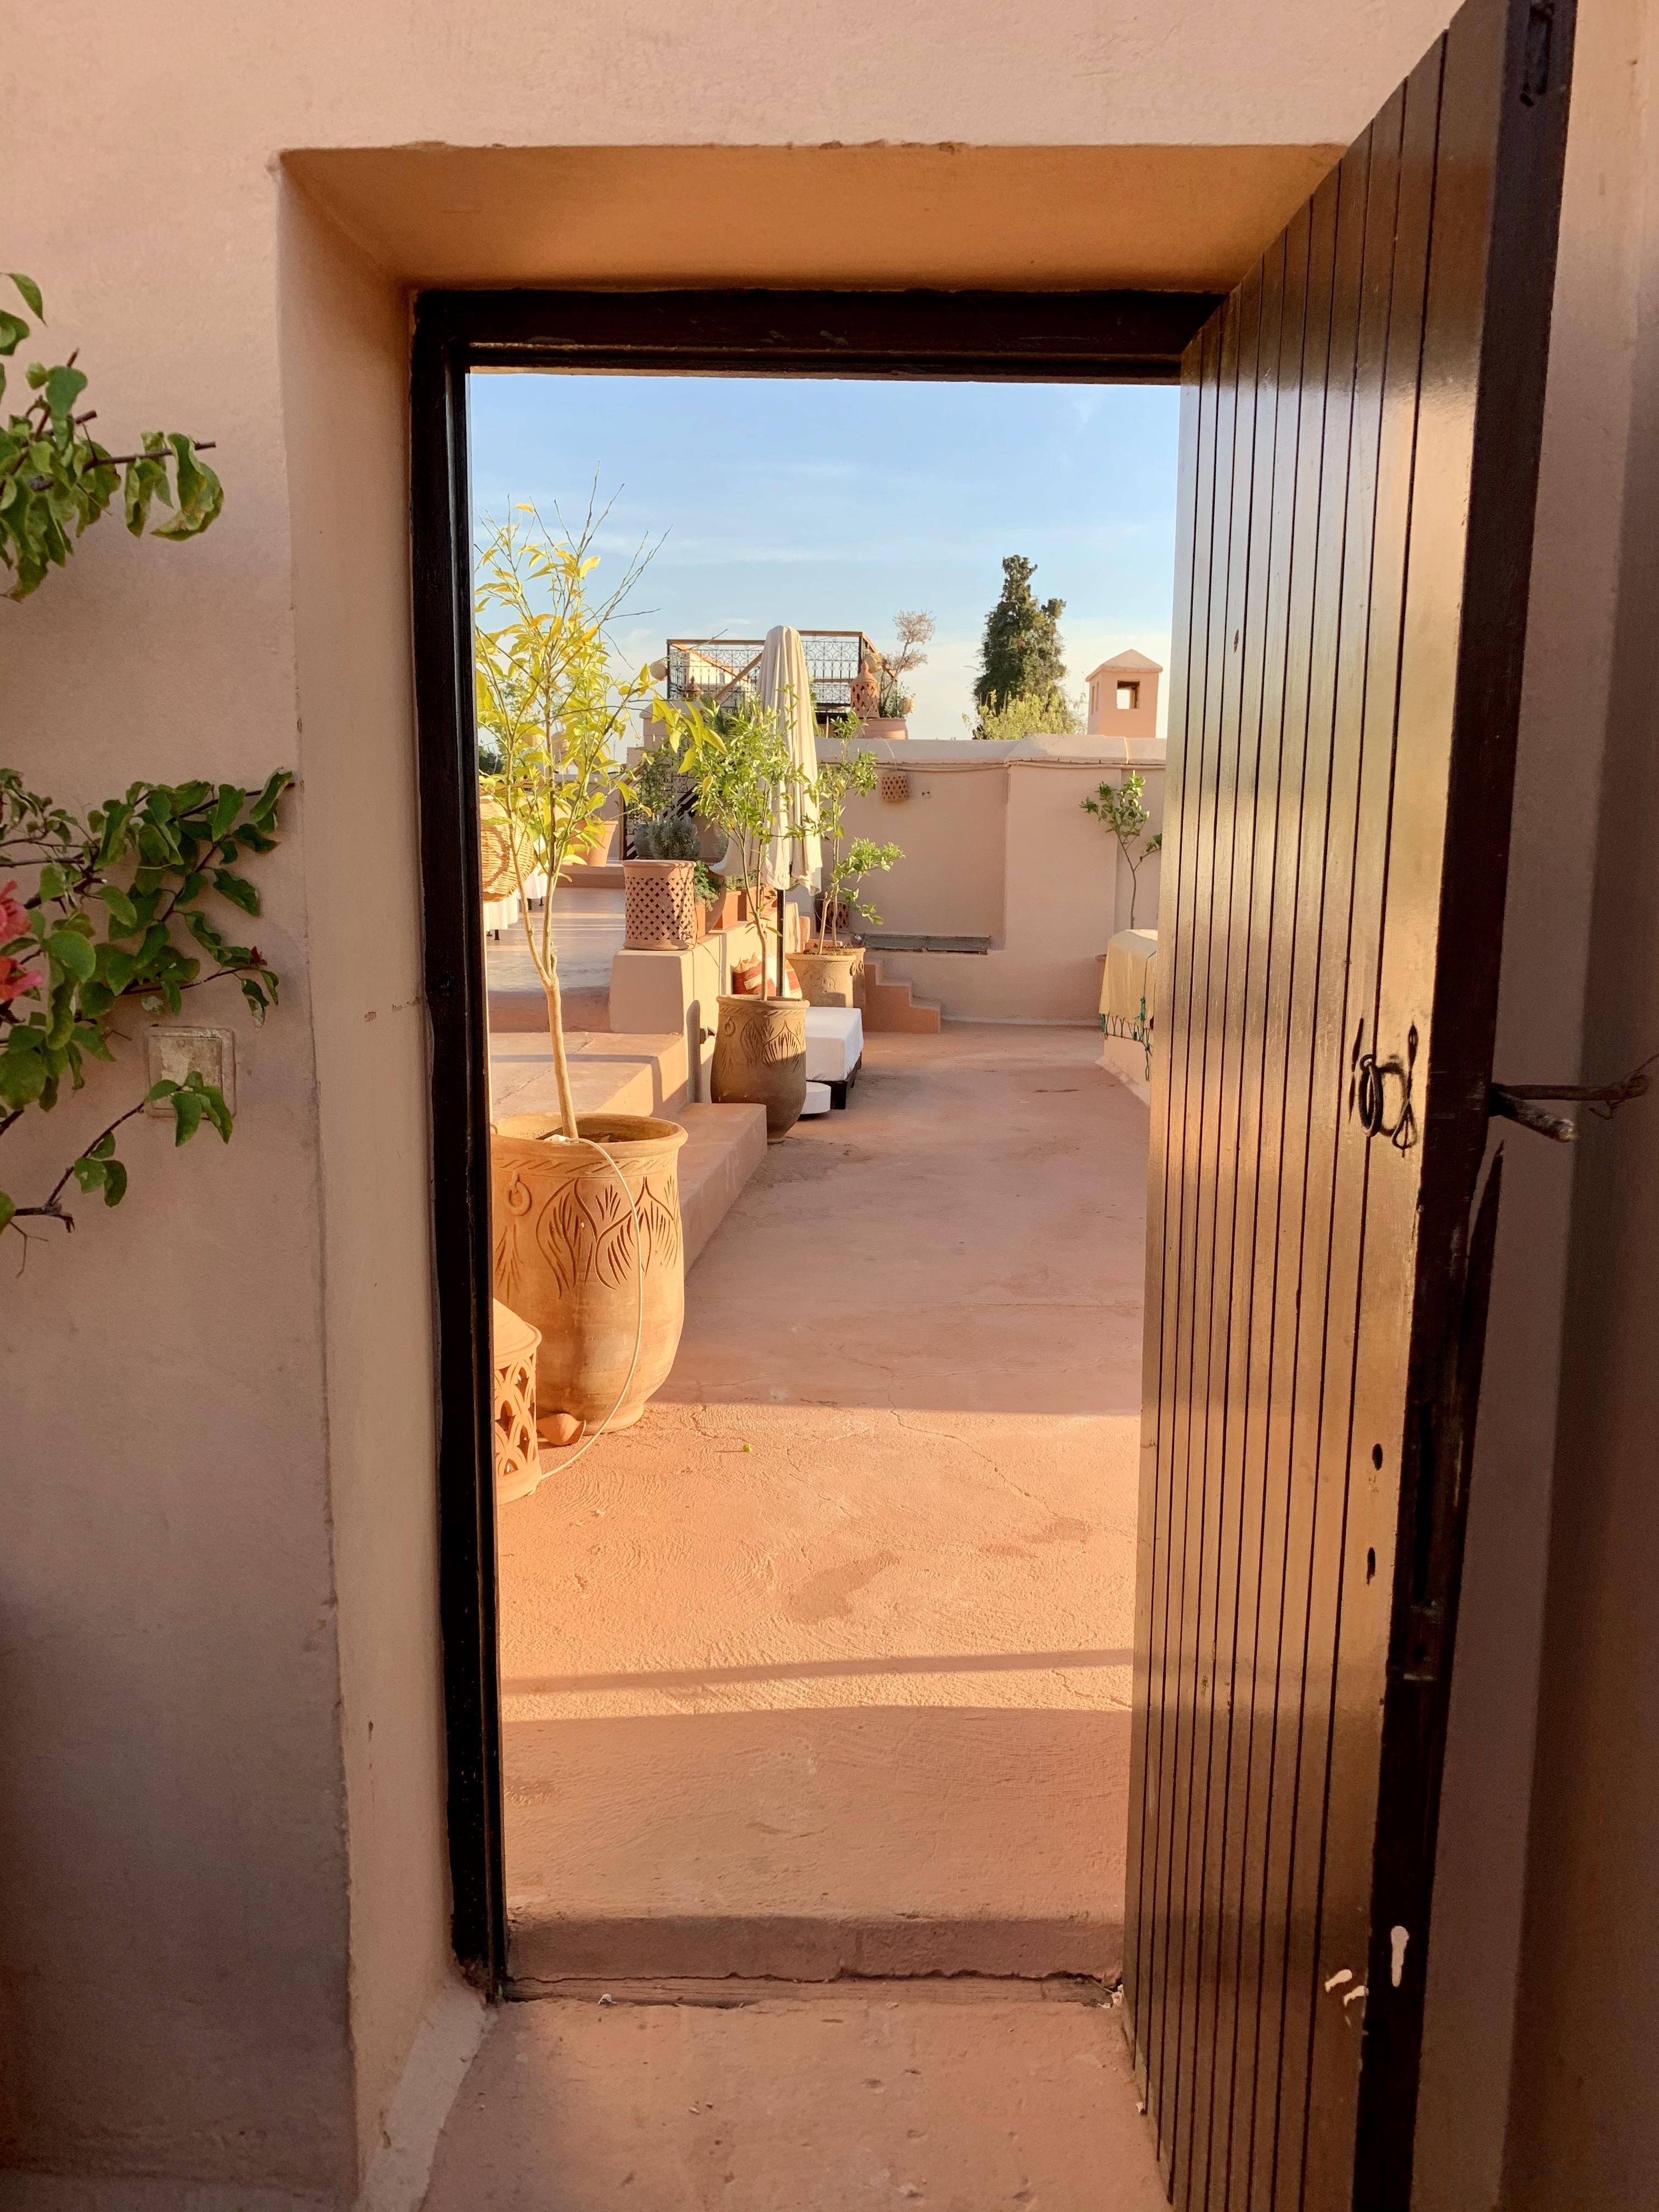 img 5714 - Marrakech, Morocco